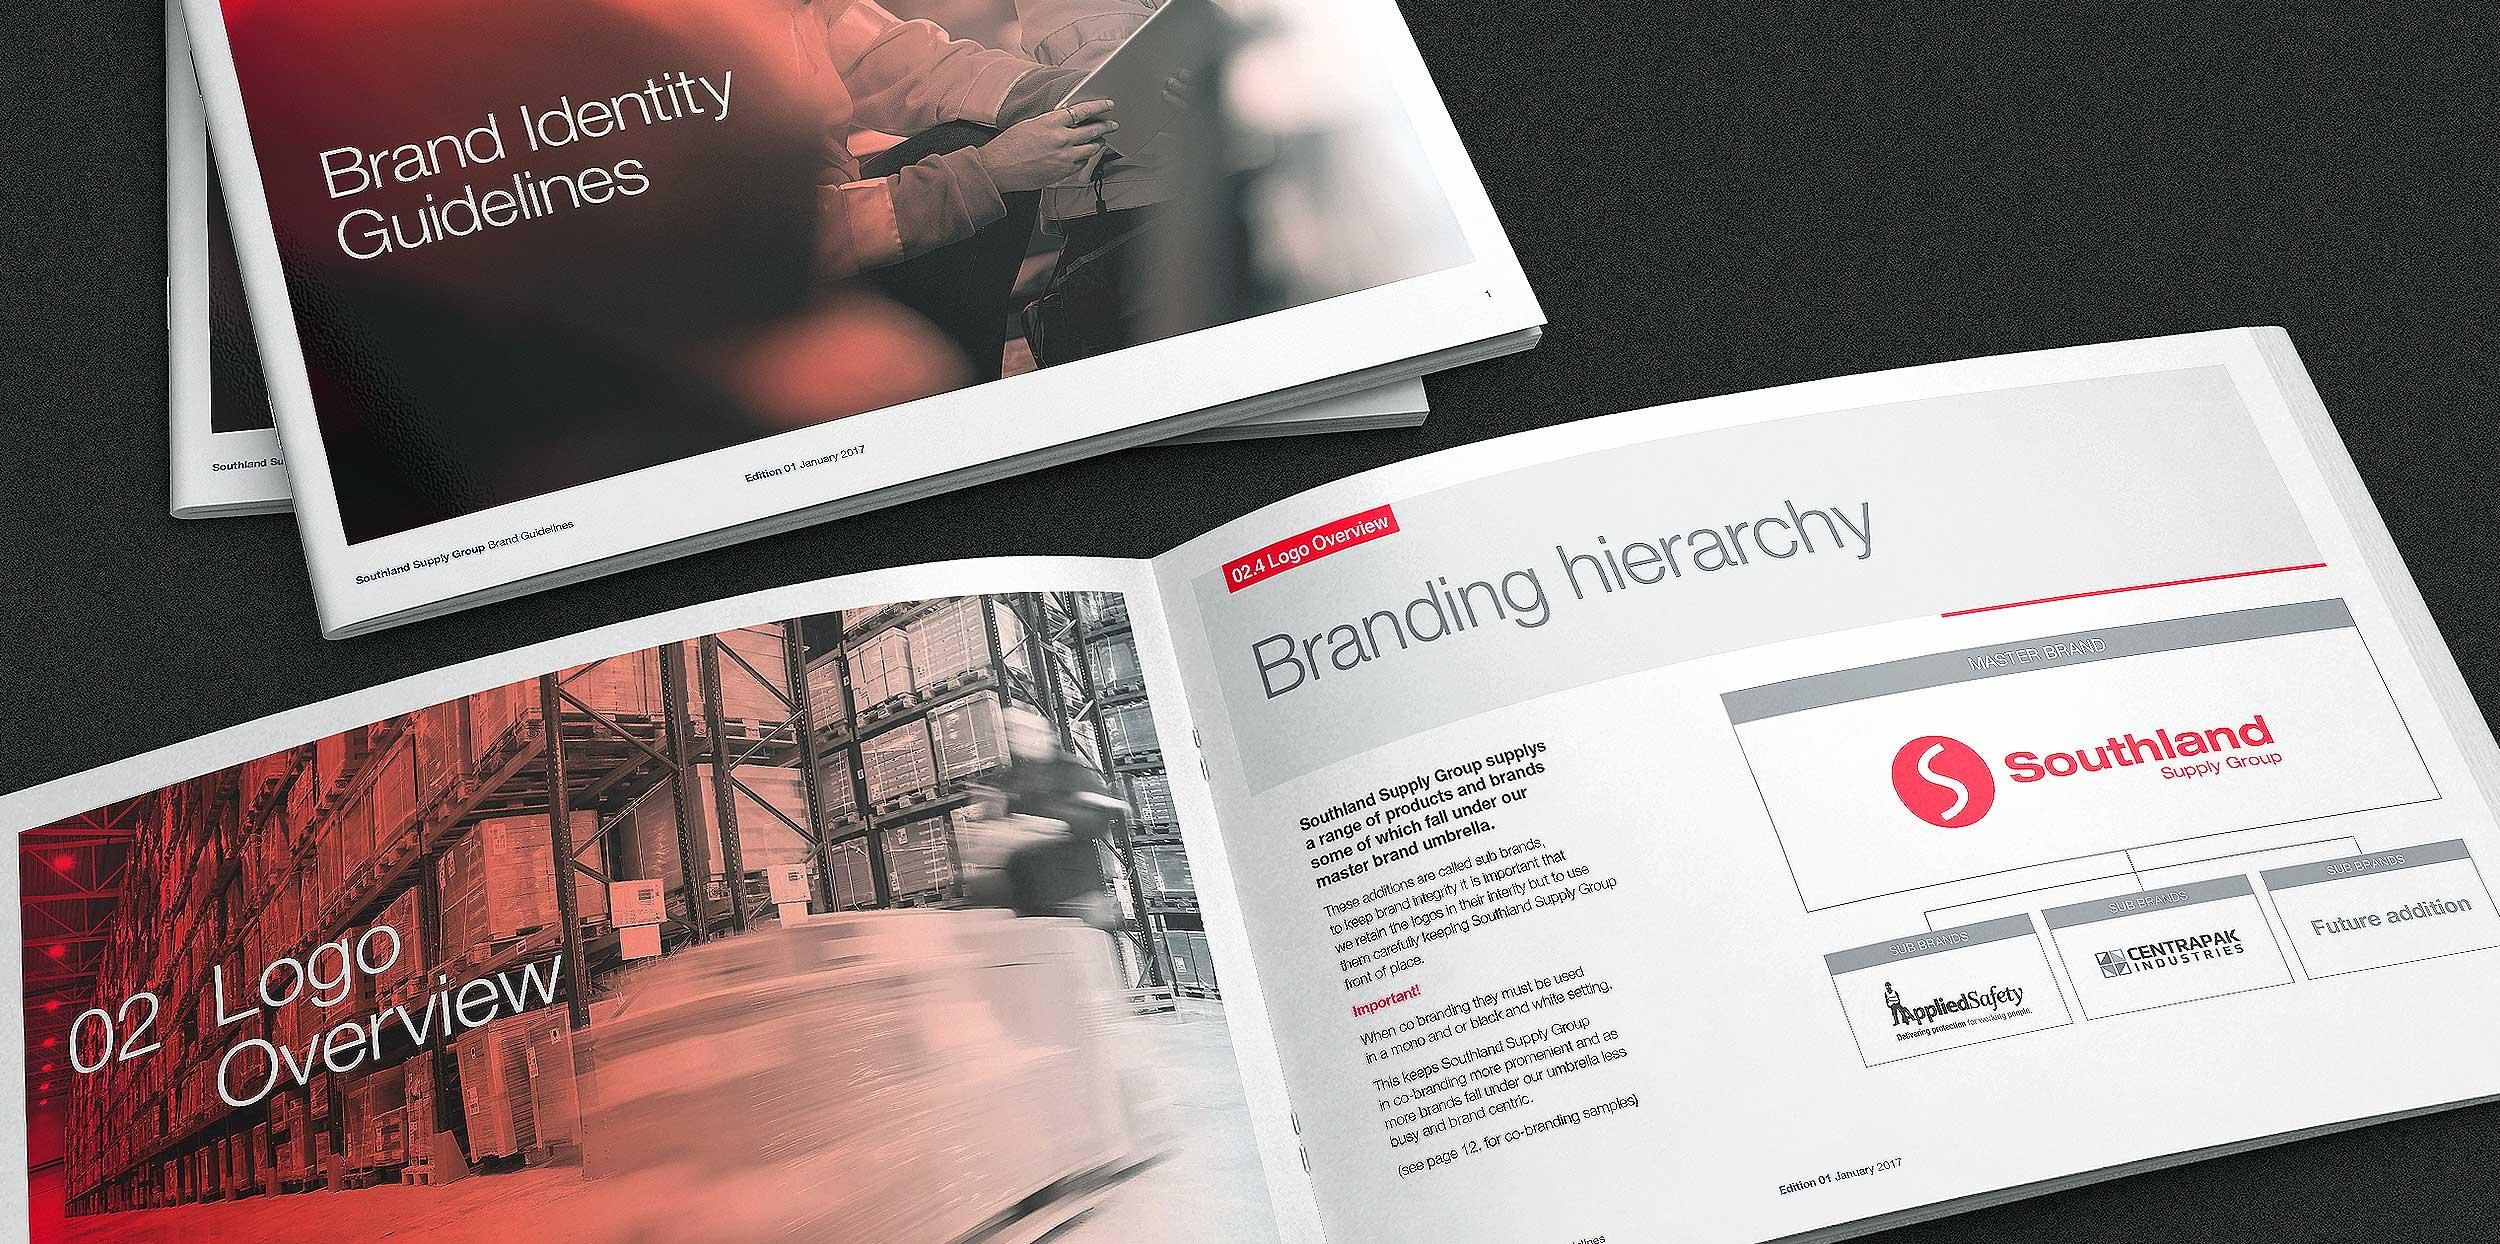 Handle-Sydney-Branding_Guidelines_Branding-Southland_1B.jpg